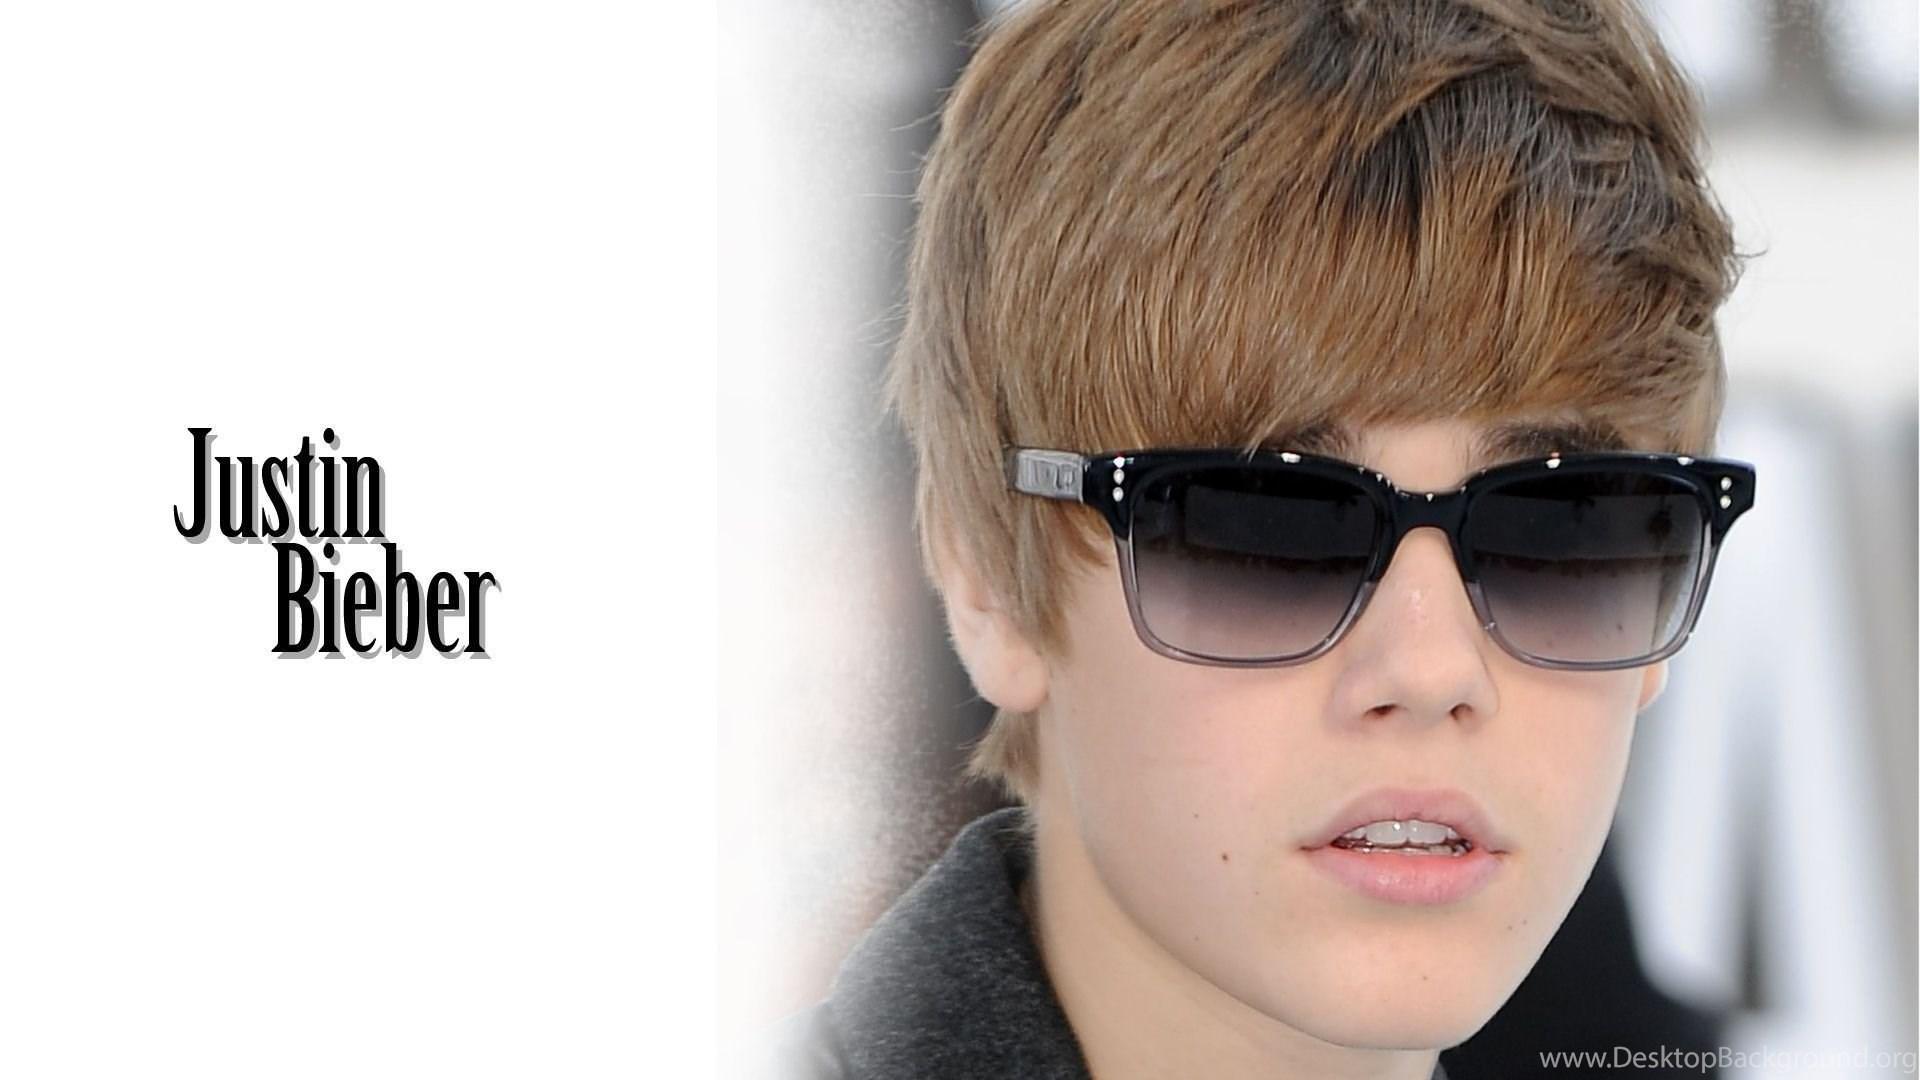 Download Justin Bieber HD Wallpapers 2016 Stylo Pictures Desktop